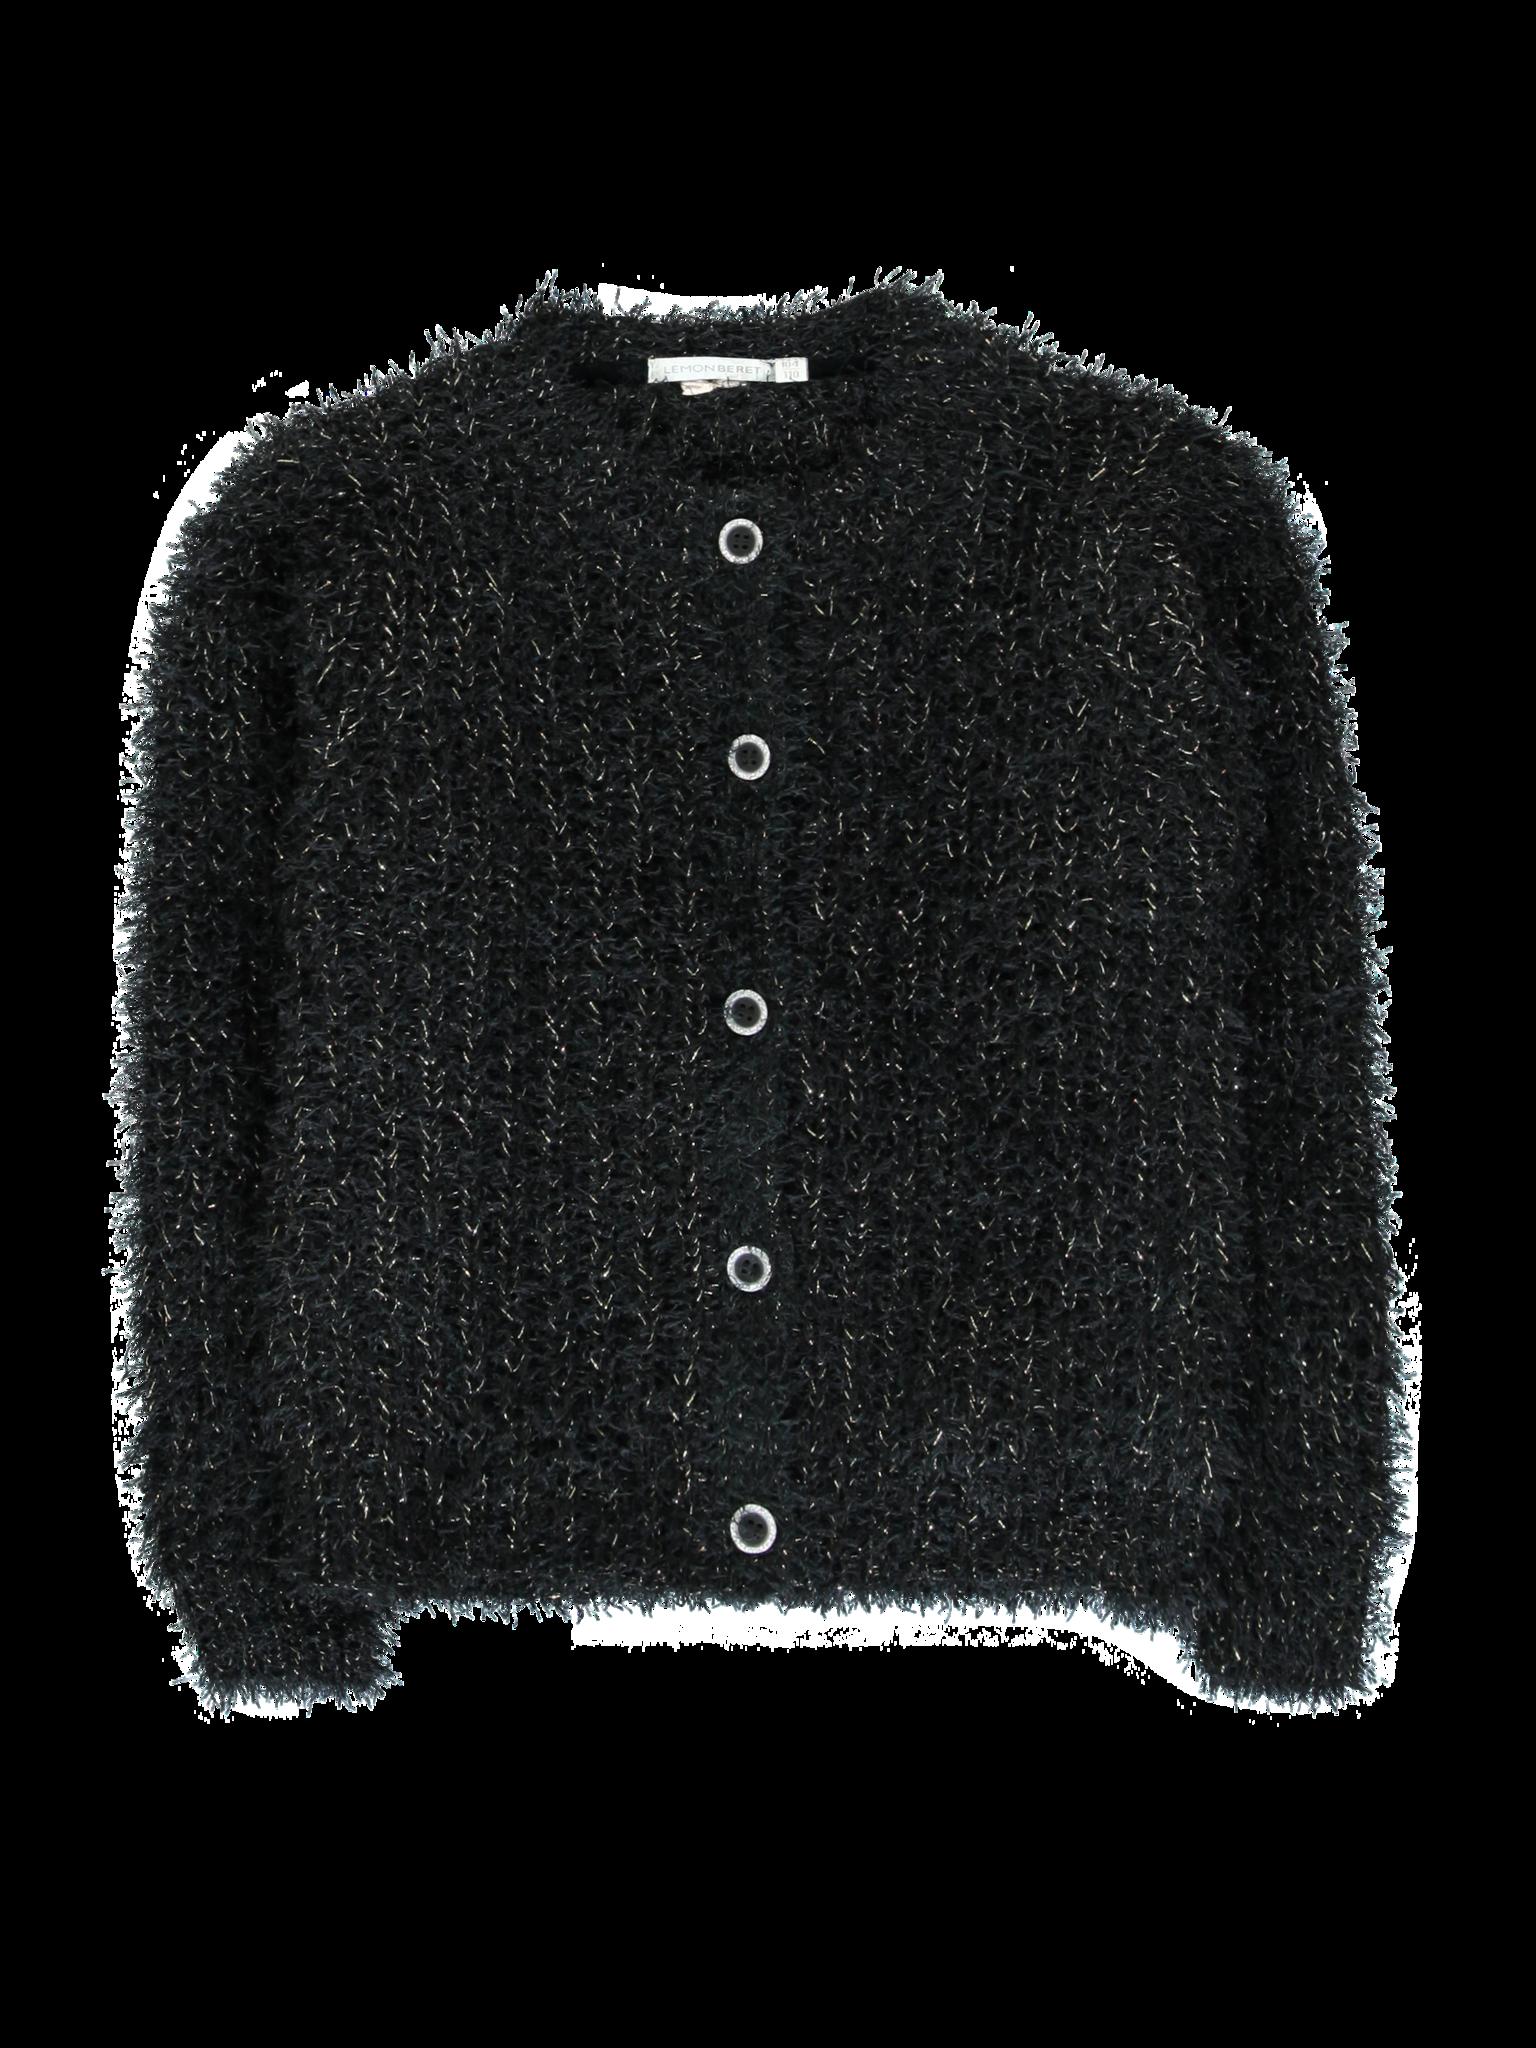 All Brands | Winterproducts Small Girls | Cardigan Knitwear | 12 pcs/box